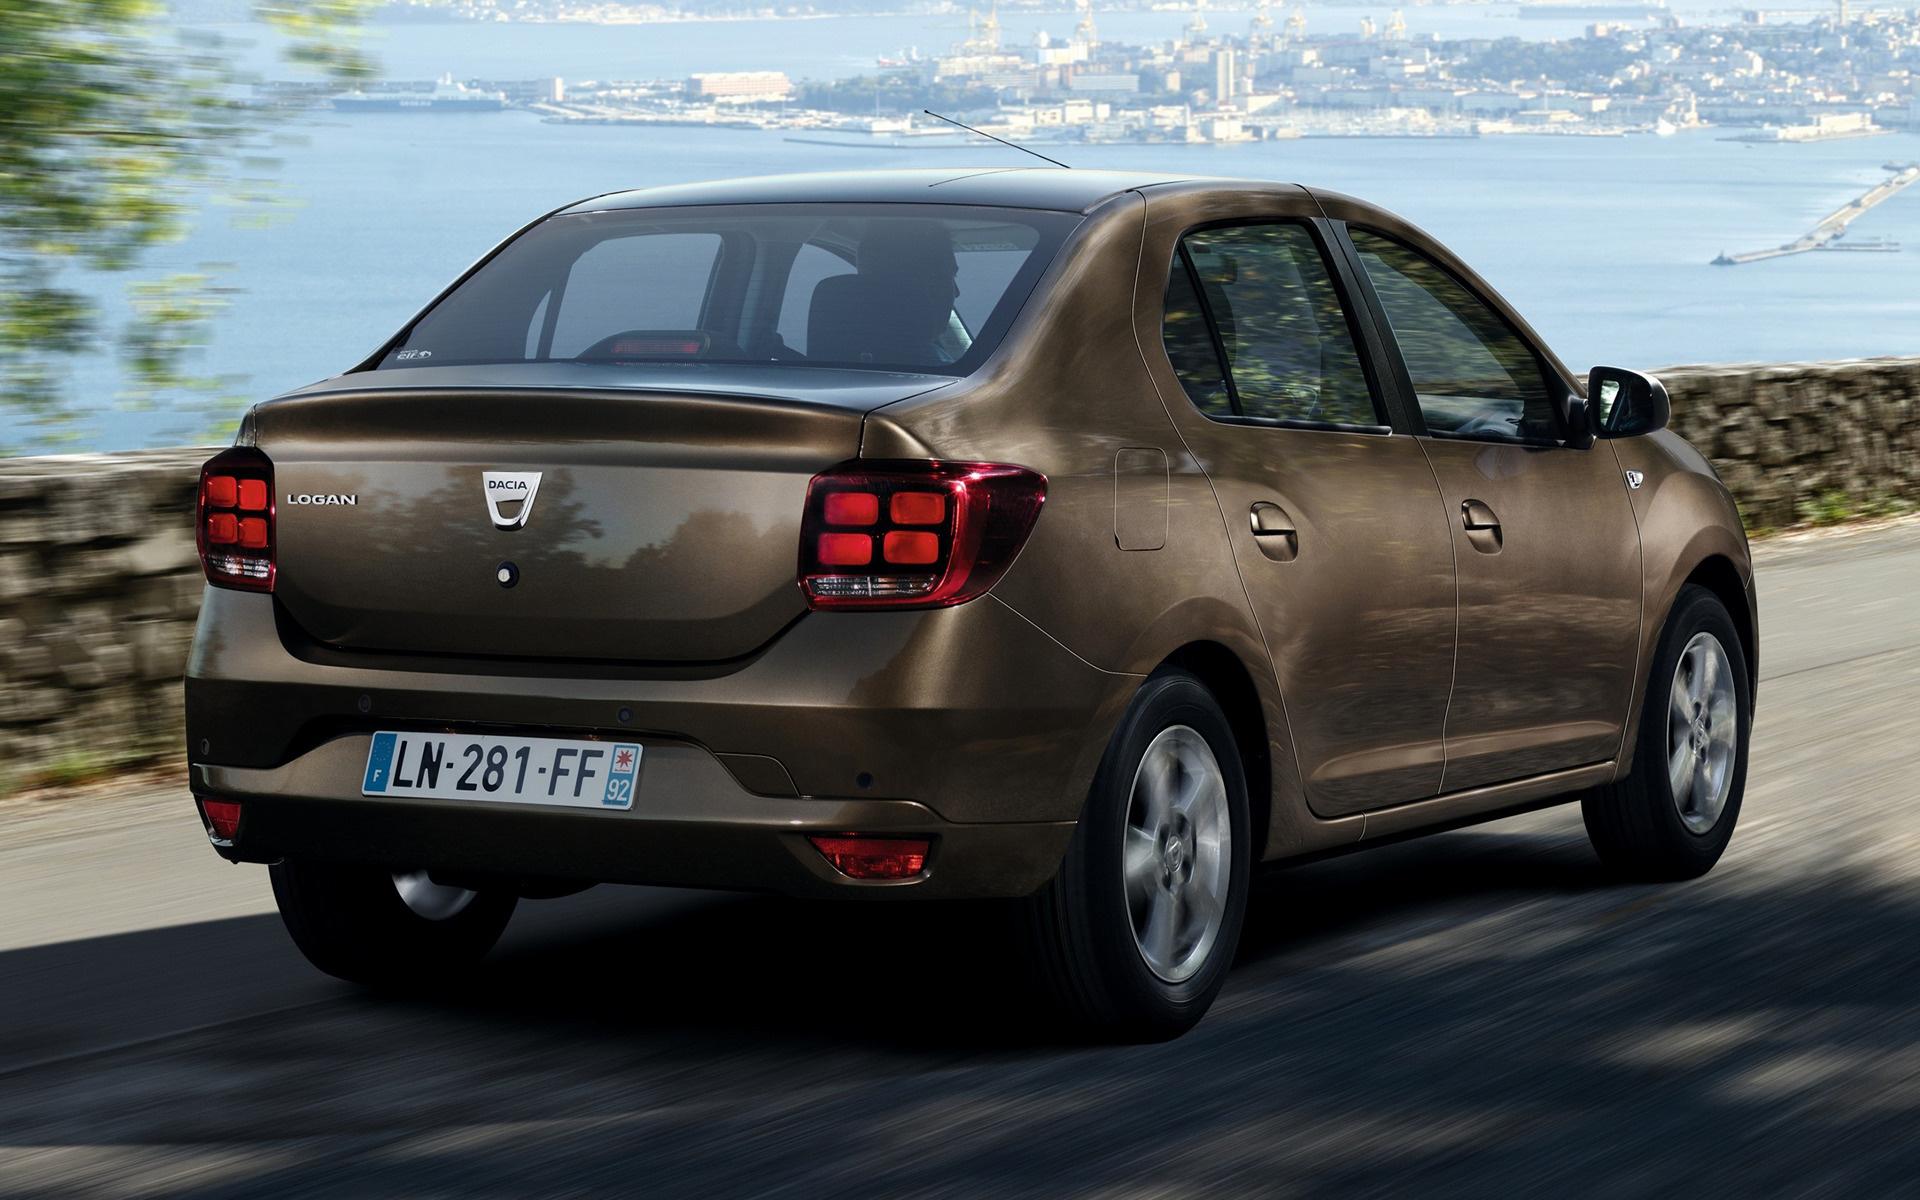 2016 Dodge Ram >> 2016 Dacia Logan - Wallpapers and HD Images | Car Pixel